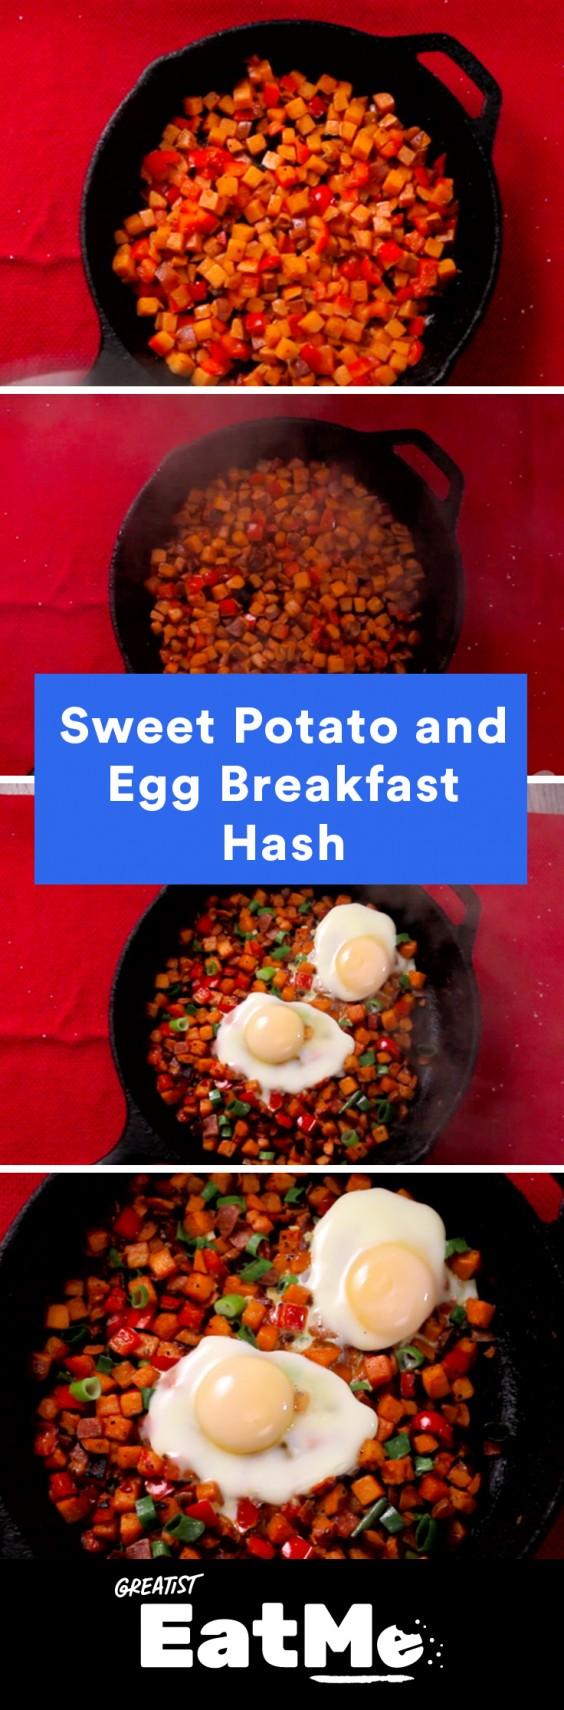 Eat Me Video: Sweet Potato Hash